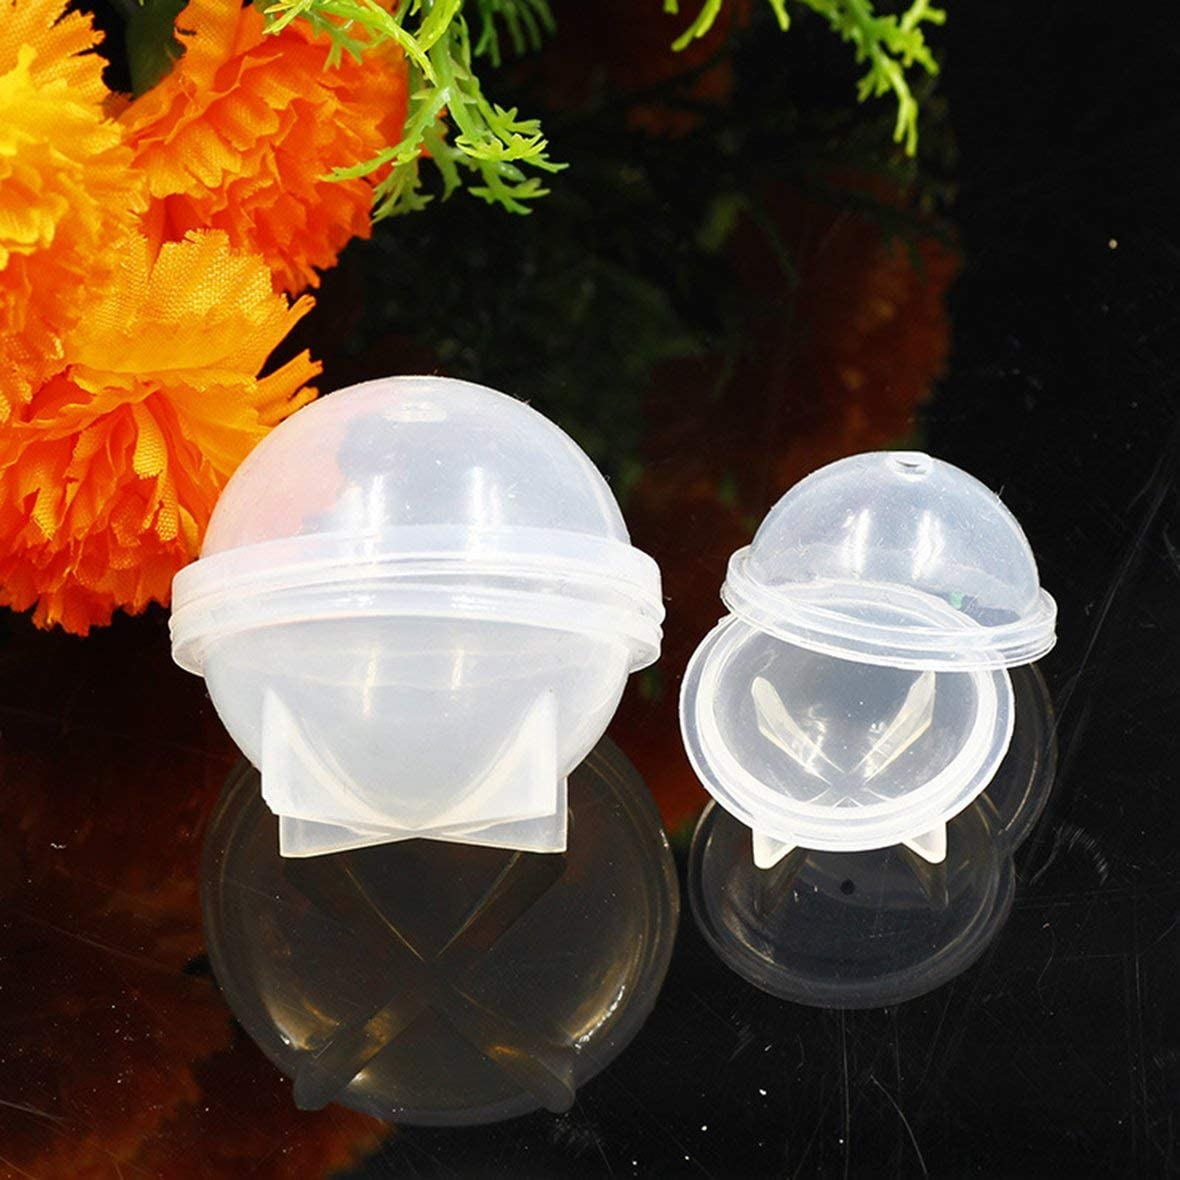 Heaviesk Bola de epoxy de Molde de Resina de Silicona de Esfera Redonda para joyer/ía Muestra de Flor DIY Bola de Gel de Gota de Cristal Hecha a Mano